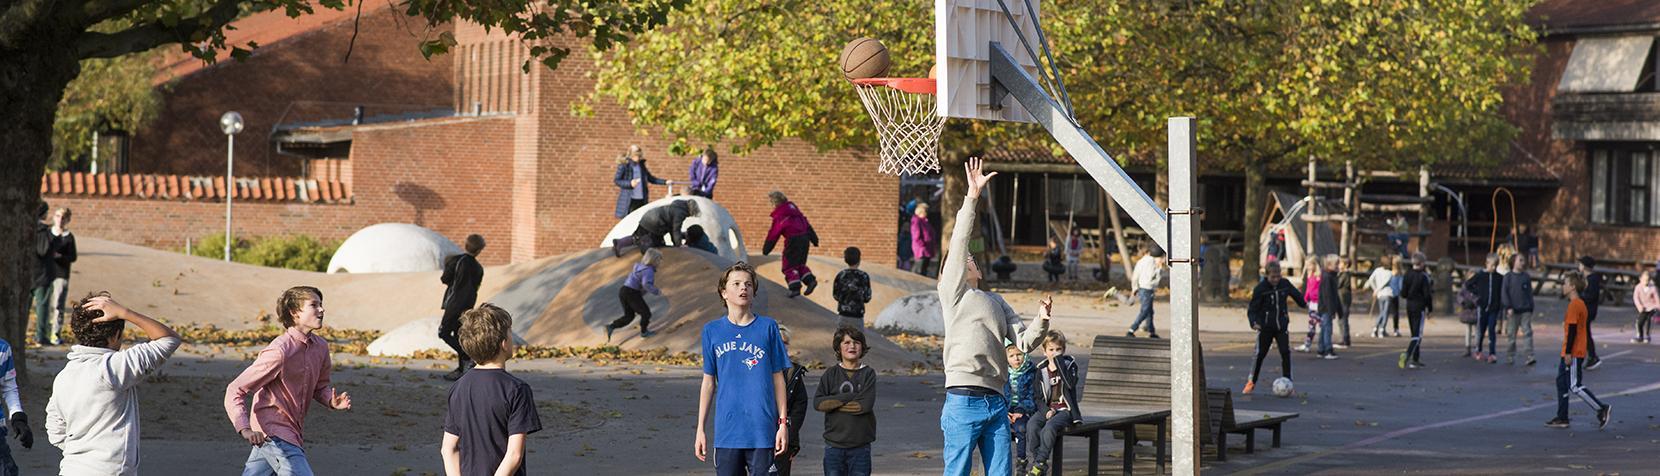 Drenge spiller basketball i skolegården